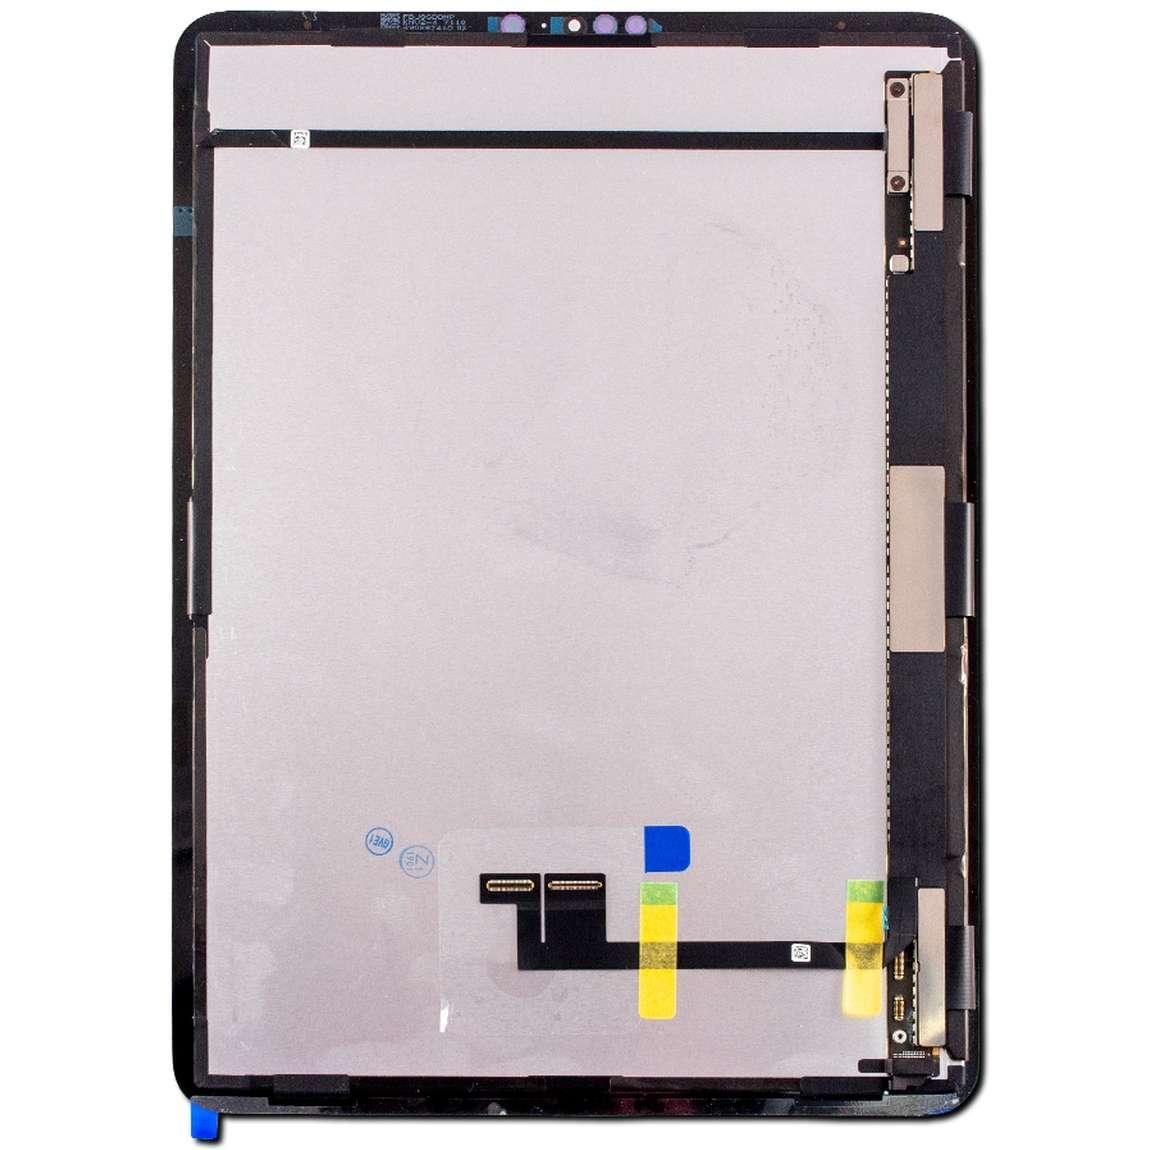 Ansamblu LCD Display Touchscreen Apple iPad Pro 11 2018 A1980 Negru imagine powerlaptop.ro 2021